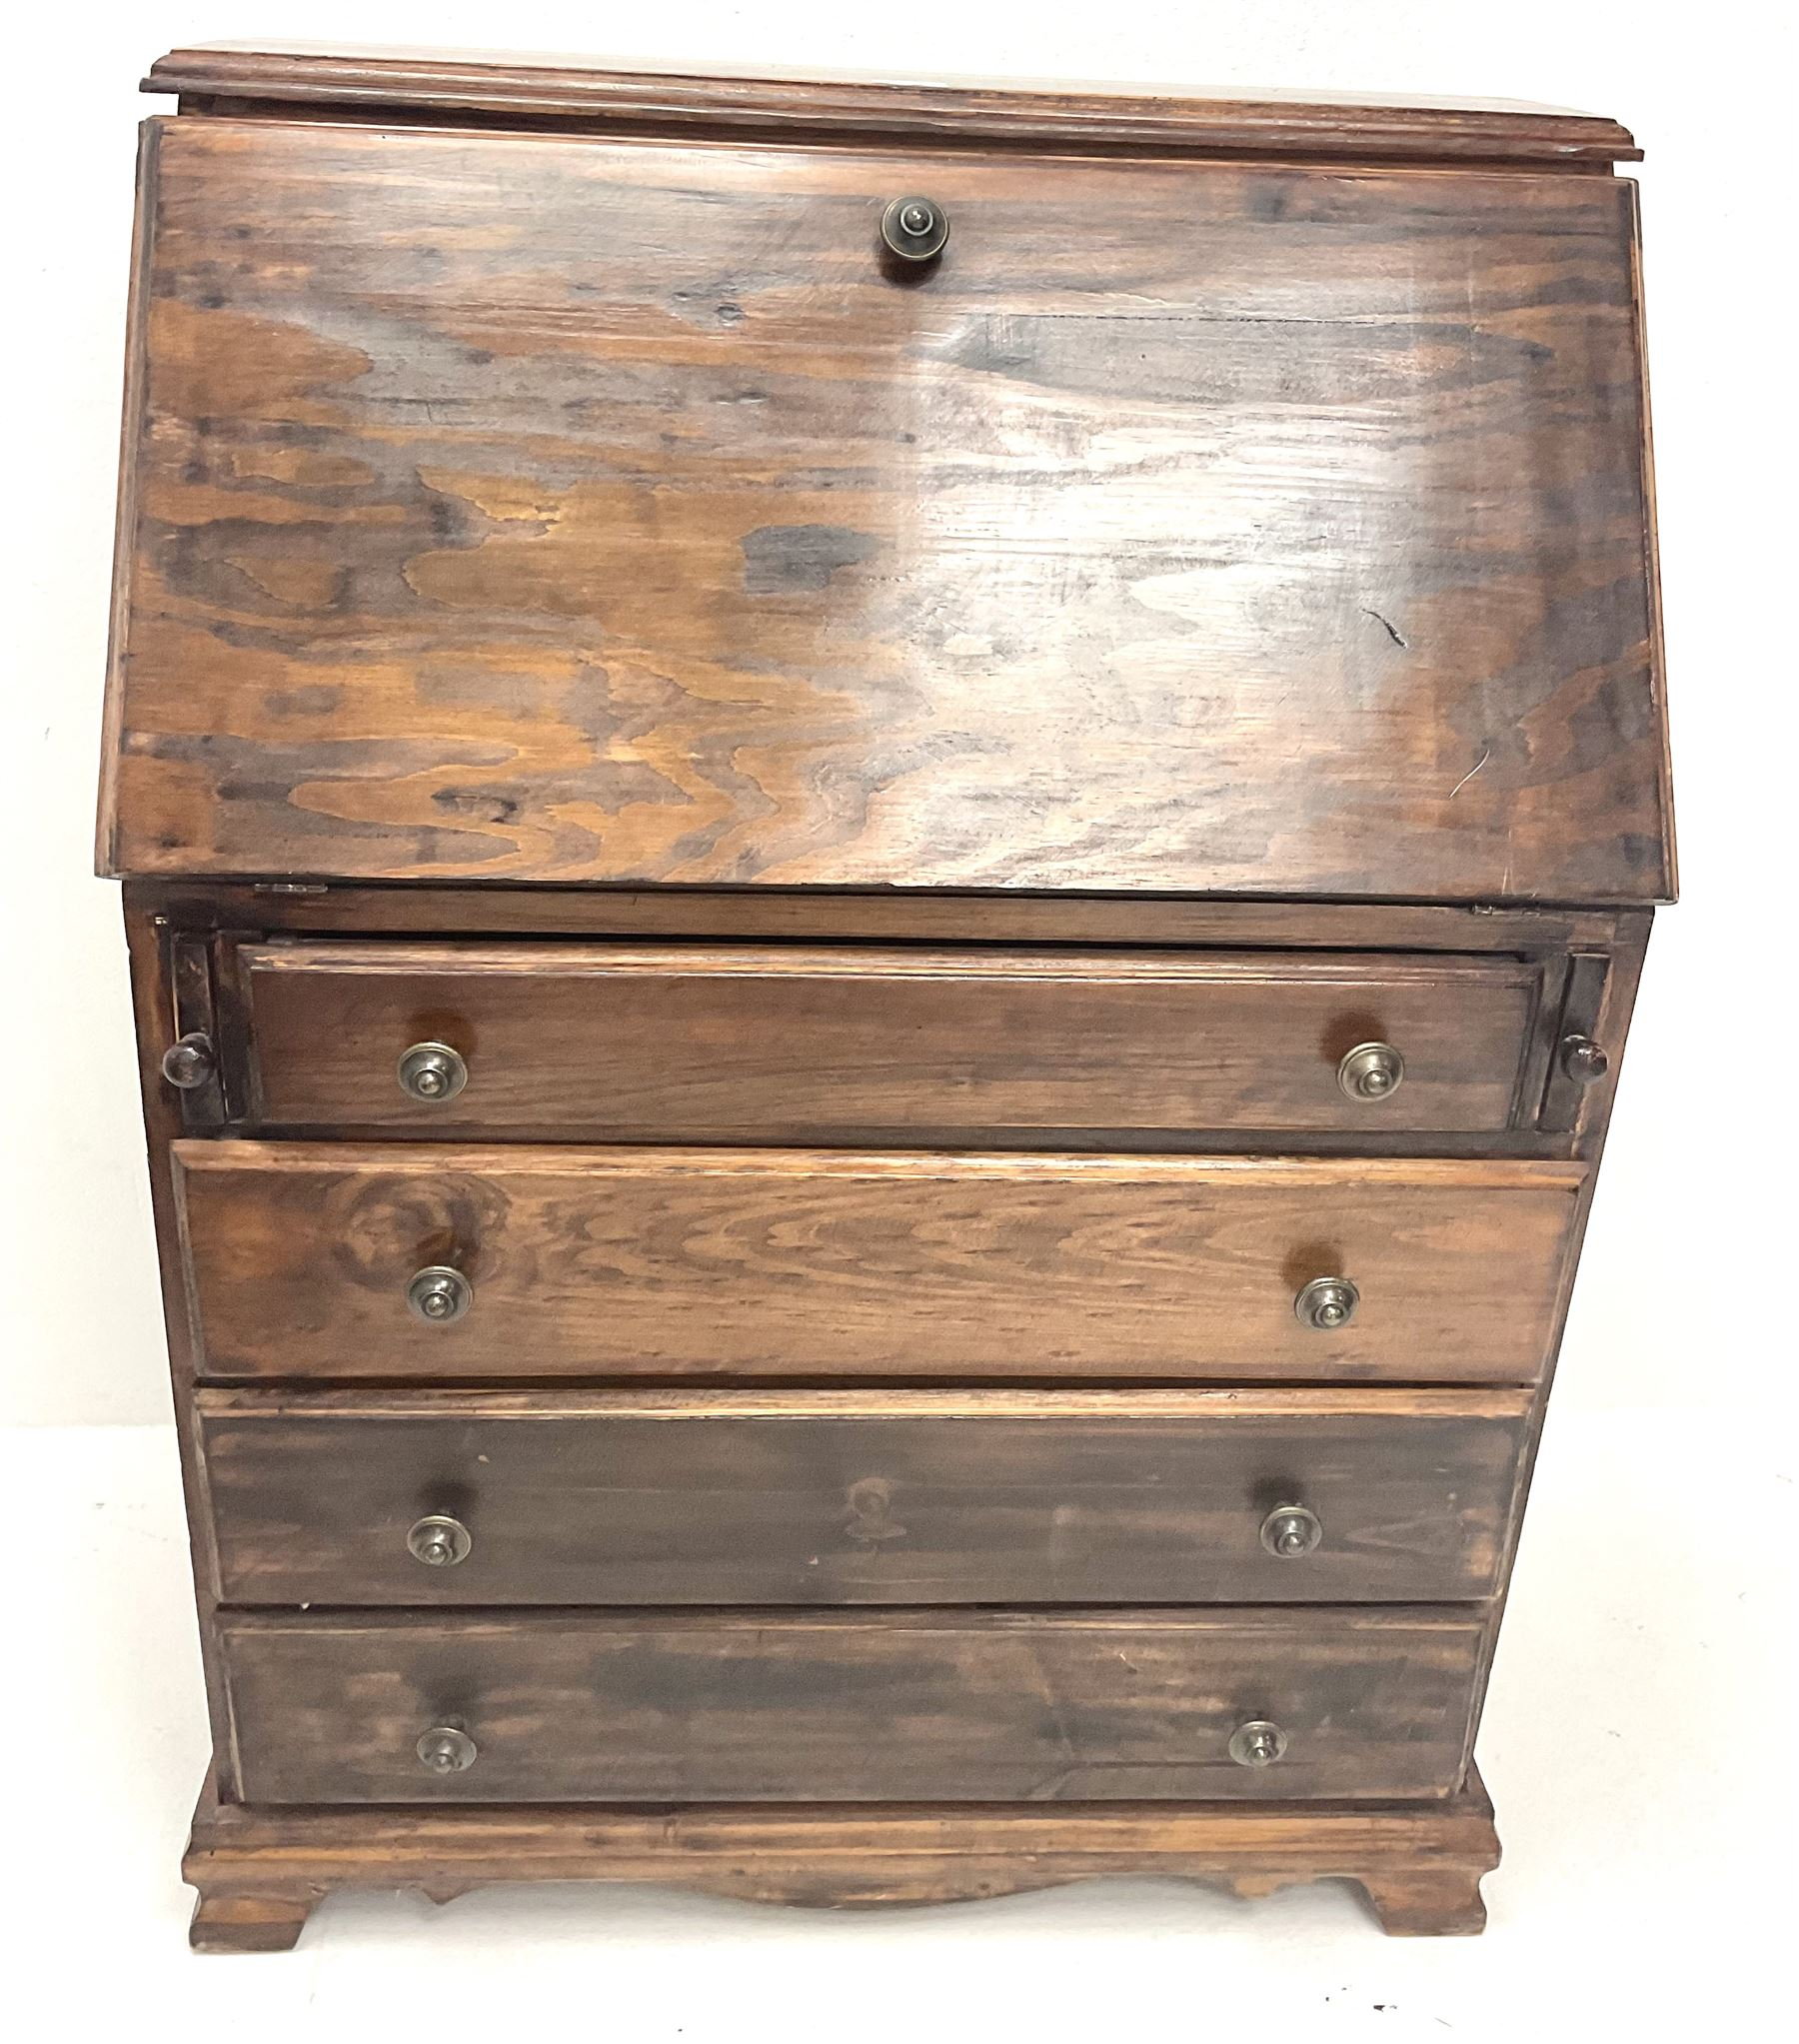 Hardwood bureau desk - Image 2 of 3